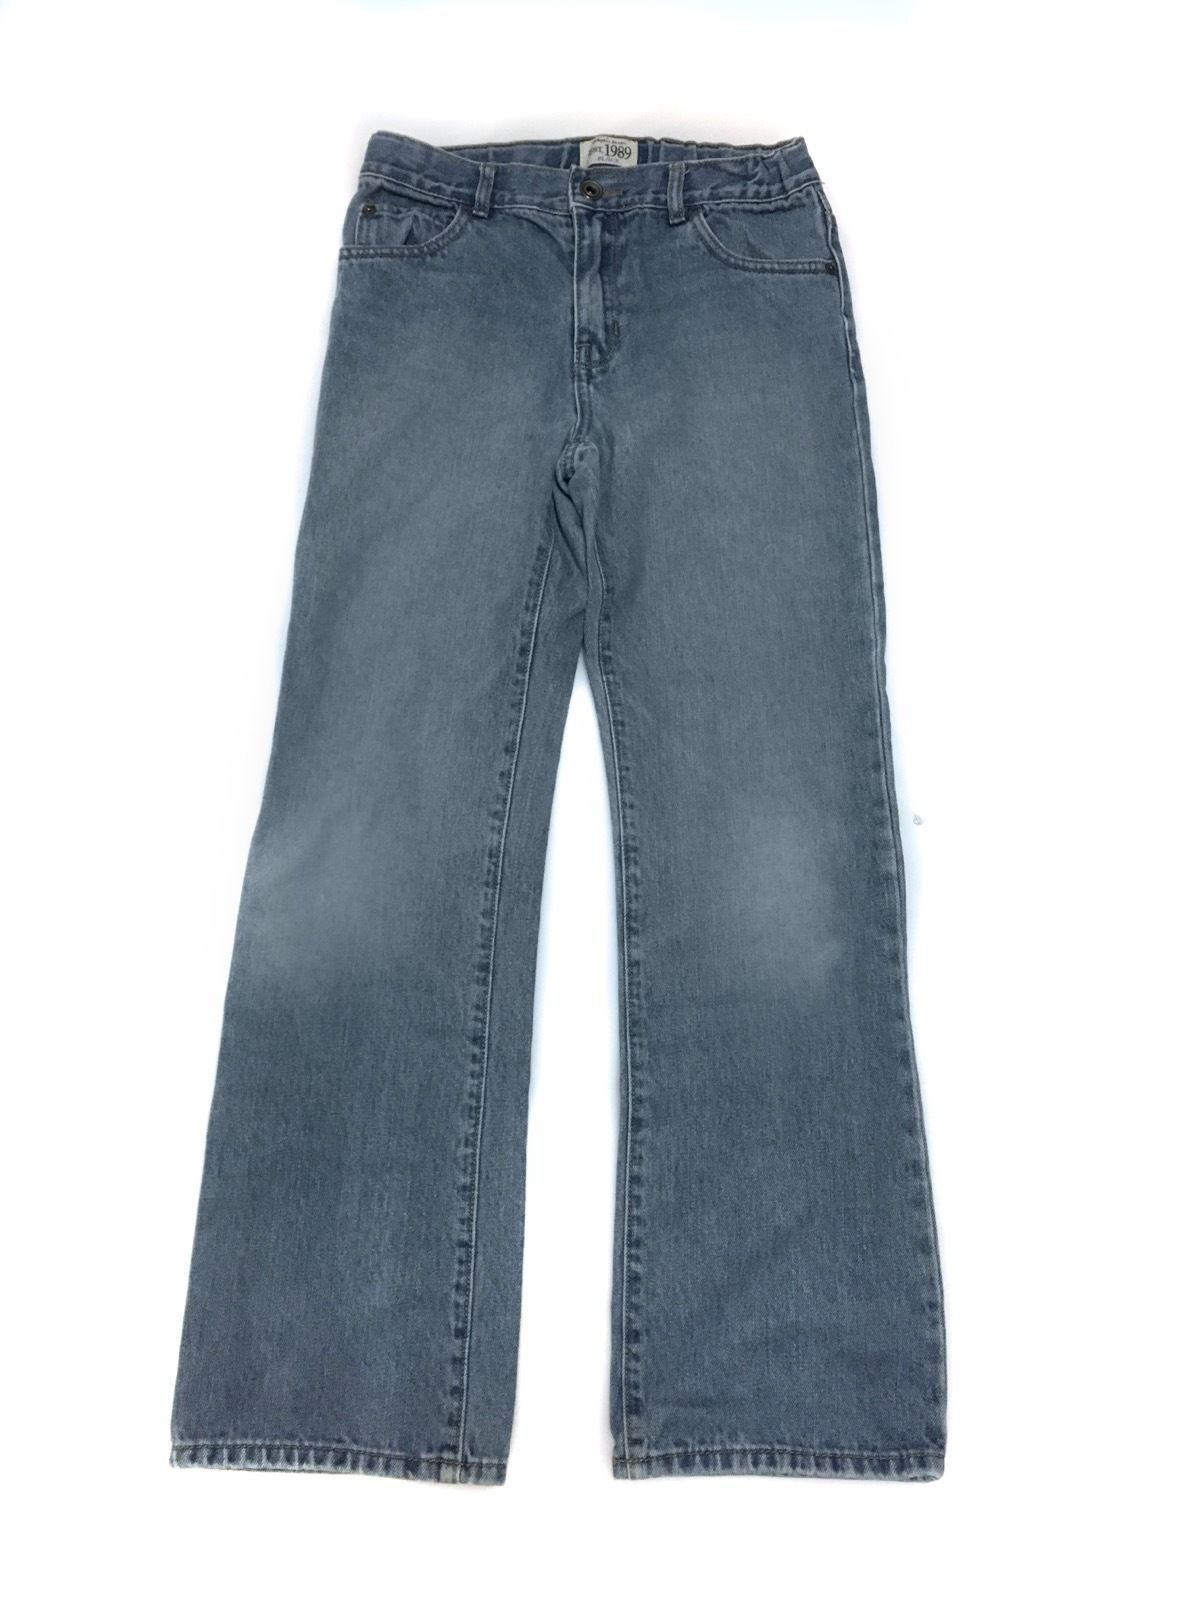 The Childrens Place Bootcut Blue Jeans Pants Denim Boys 12s 12 S Slim